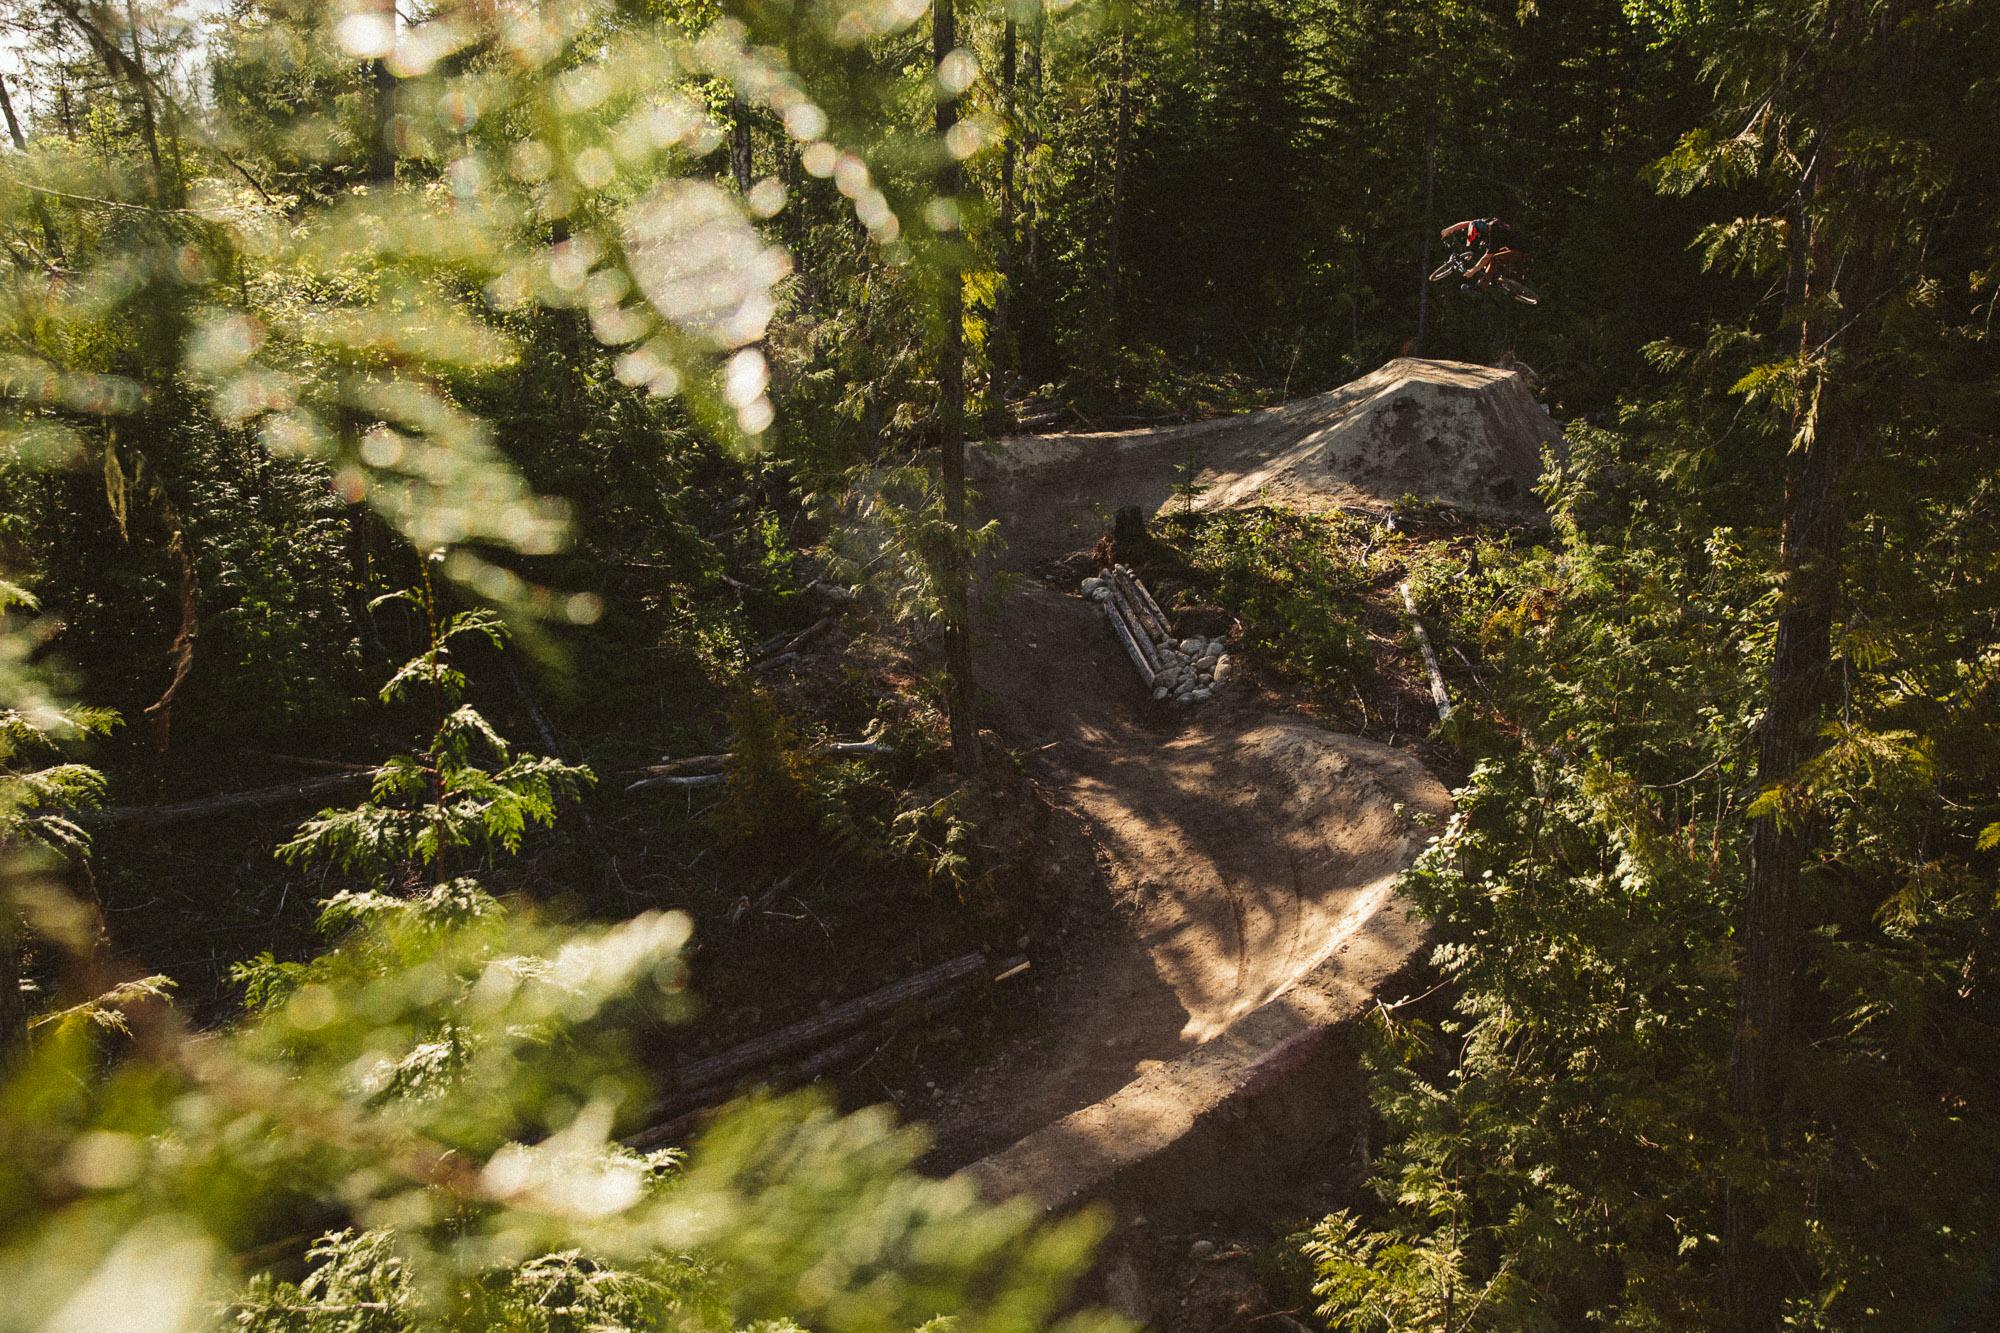 Red Bull Dream Slalom - Bas van Steenbergen, Vernon BC